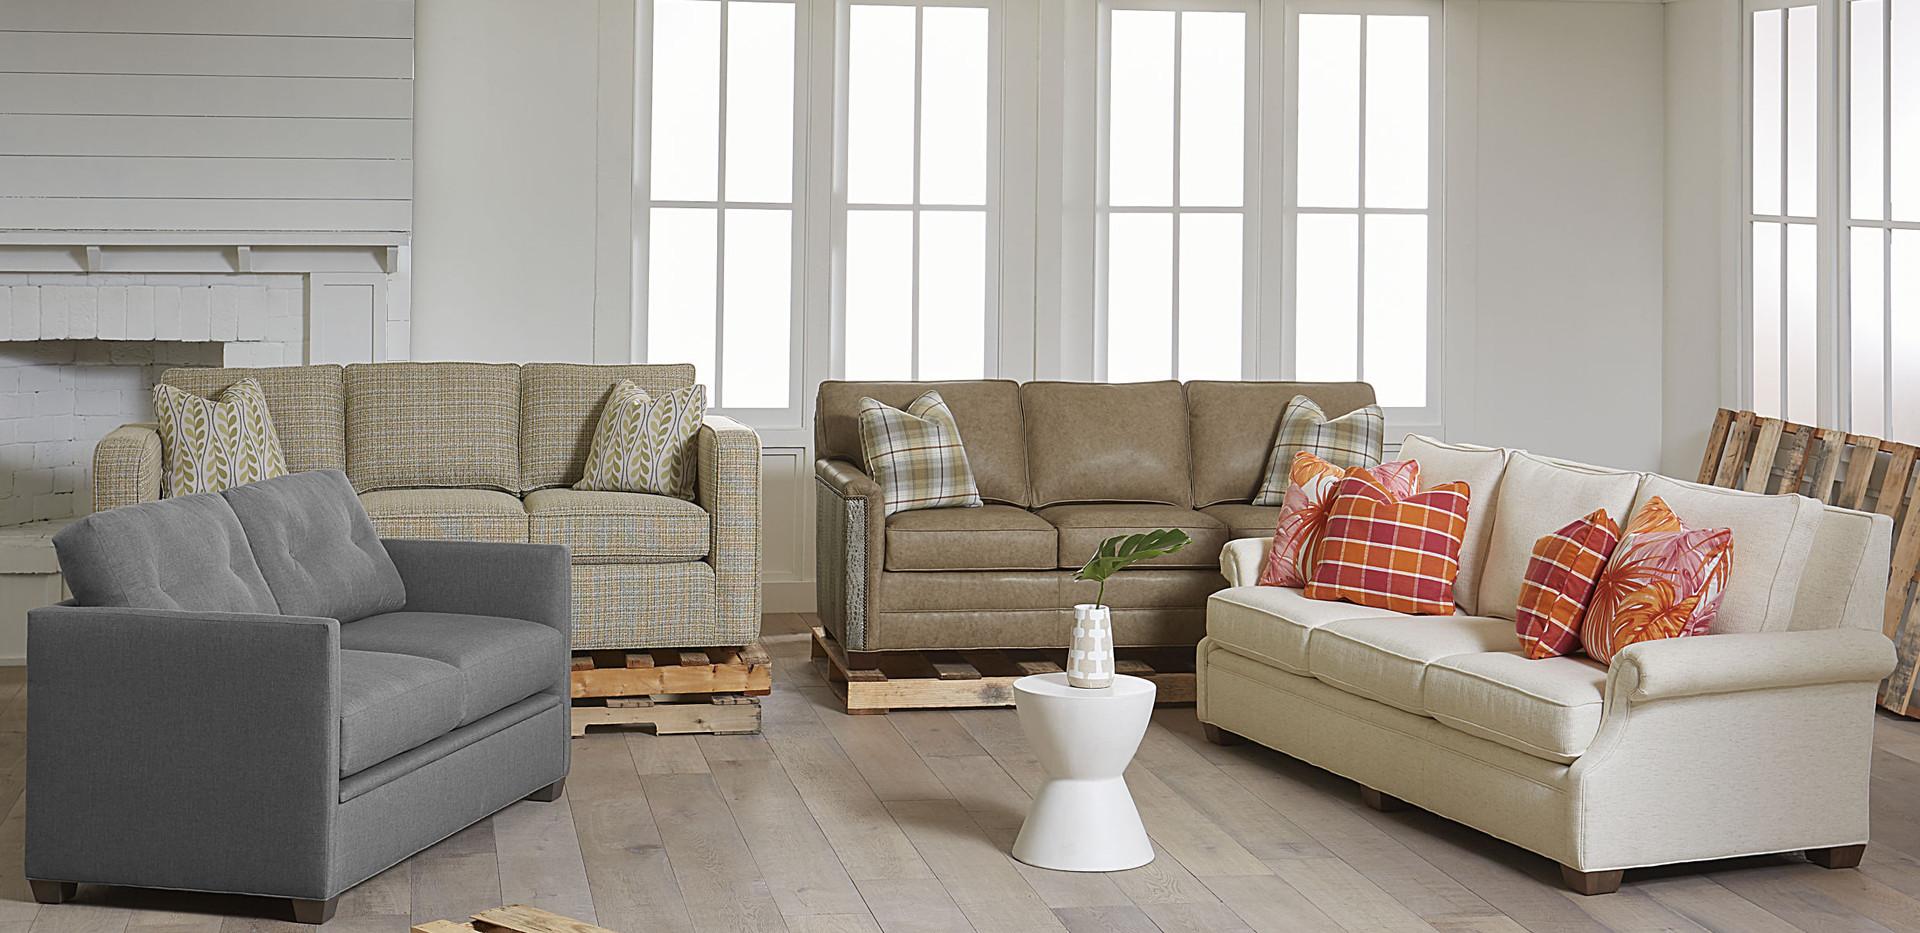 grey vs brwon sofas 1.jpg